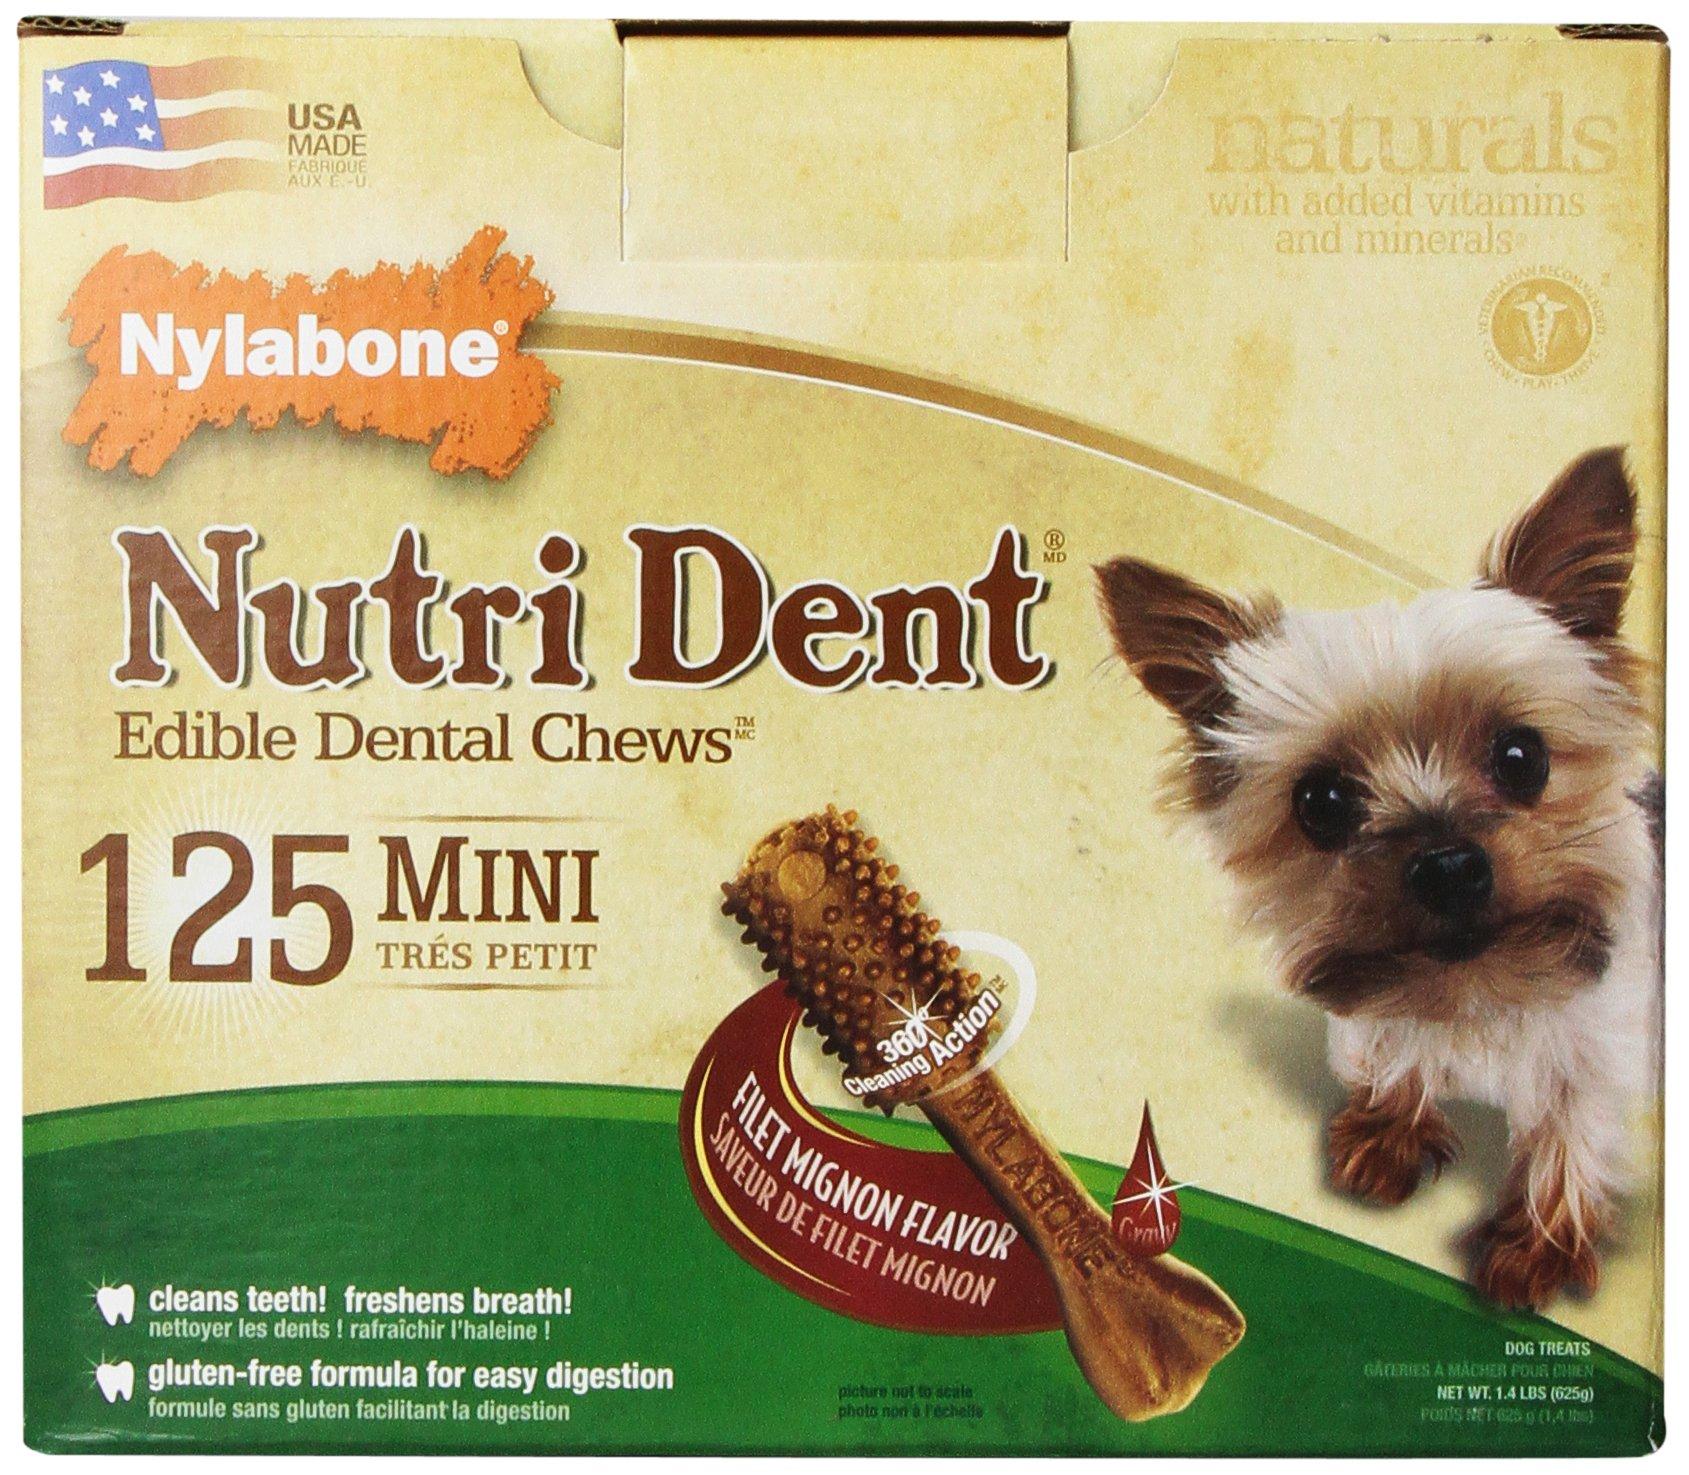 Nylabone Nutri Dent Filet Mignon, 125-Count Pantry Pack